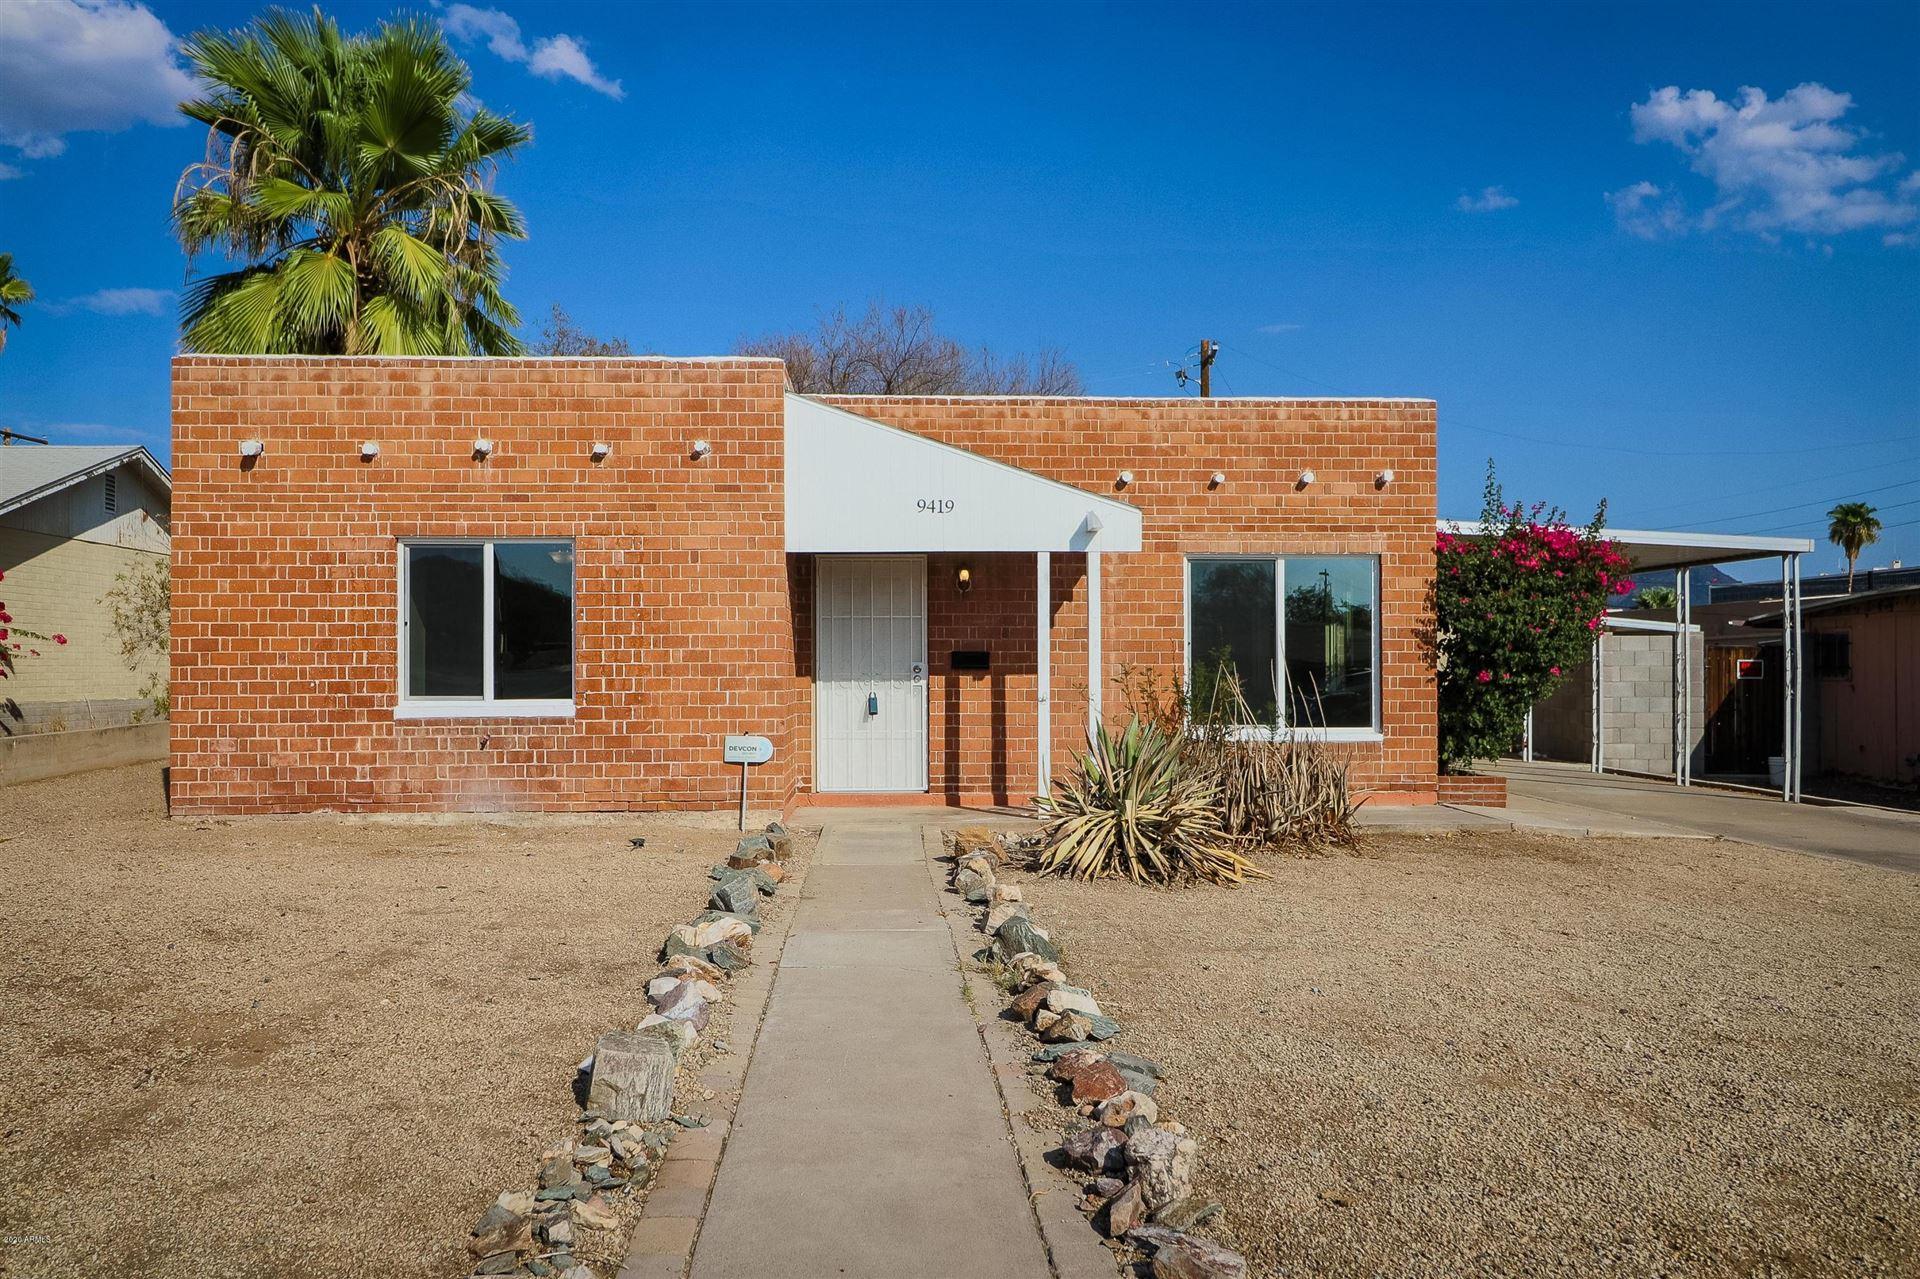 9419 N 1ST Avenue, Phoenix, AZ 85021 - MLS#: 6136132